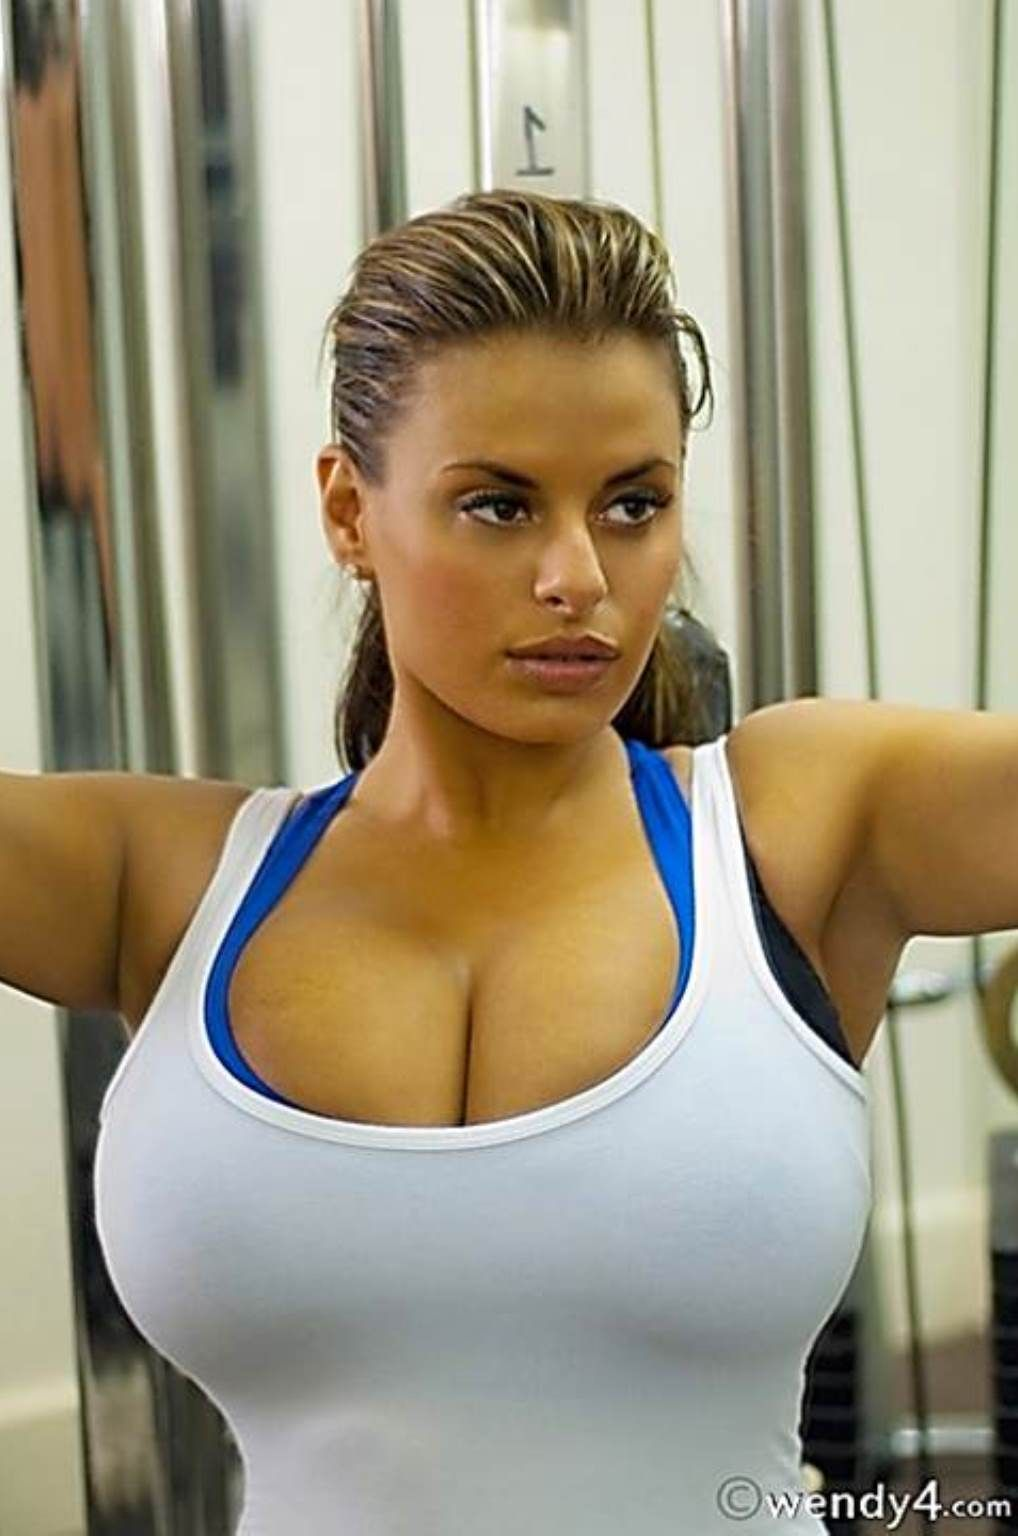 Heisse Girls Anziehen Kurvige Passform Molliges Model Weibliche Models Fitness Frauen